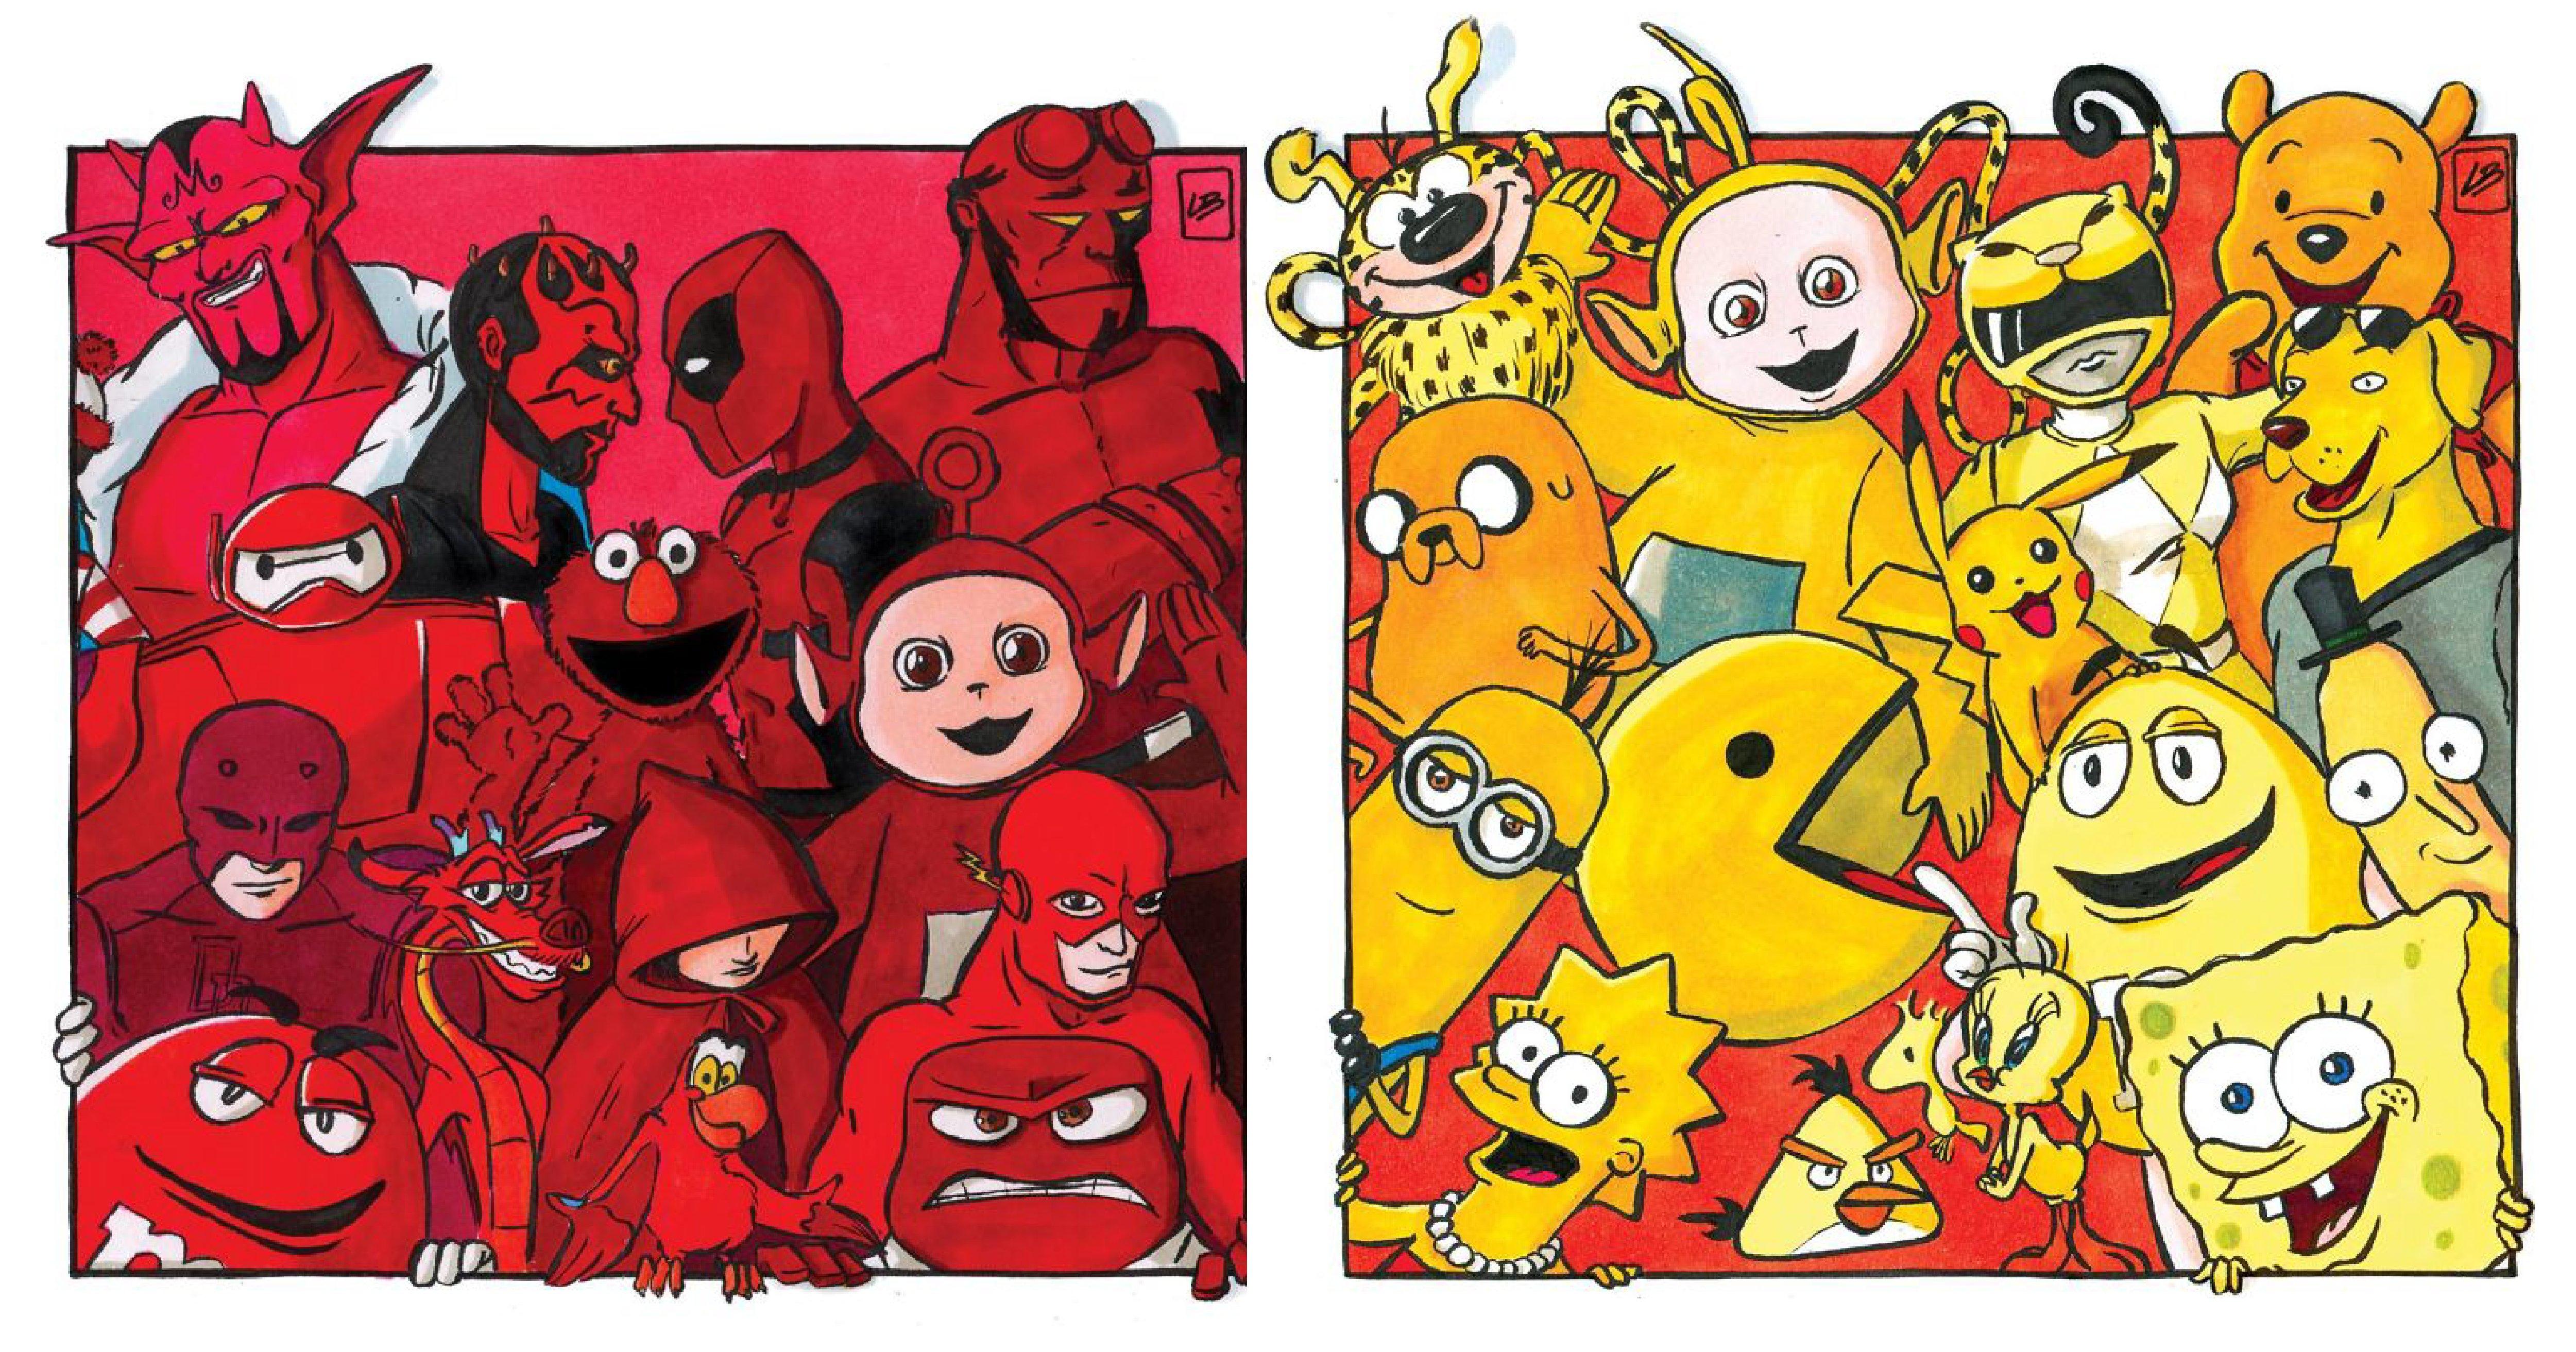 e5b081e99da2 2 1.png?resize=300,169 - 法國插畫家超有才!用顏色分類各大動漫角色 ... 看完後你想加入哪支超級戰隊?